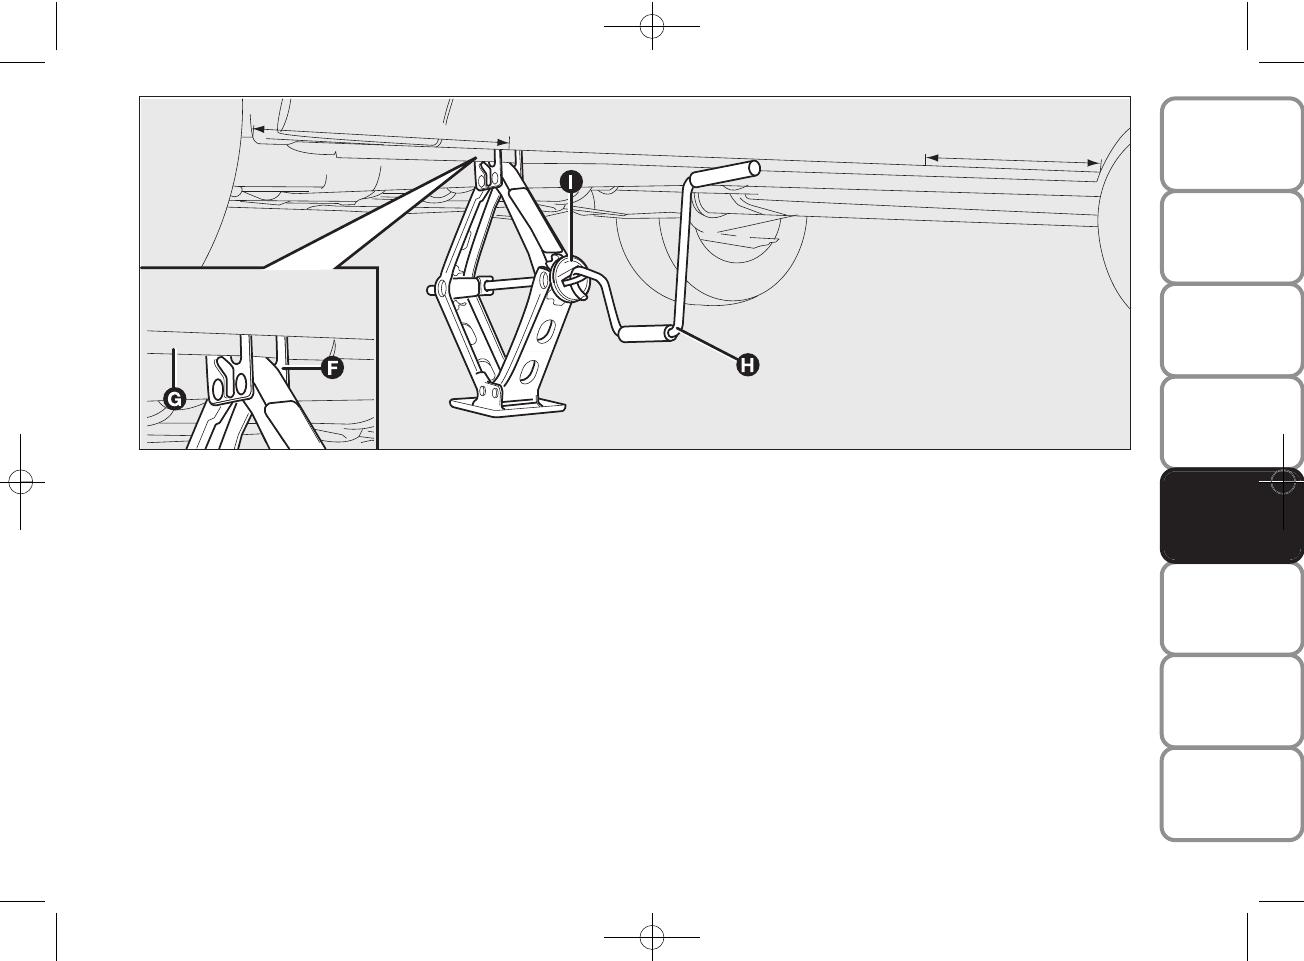 Handleiding Ford Ka Pagina 117 Van 189 Nederlands